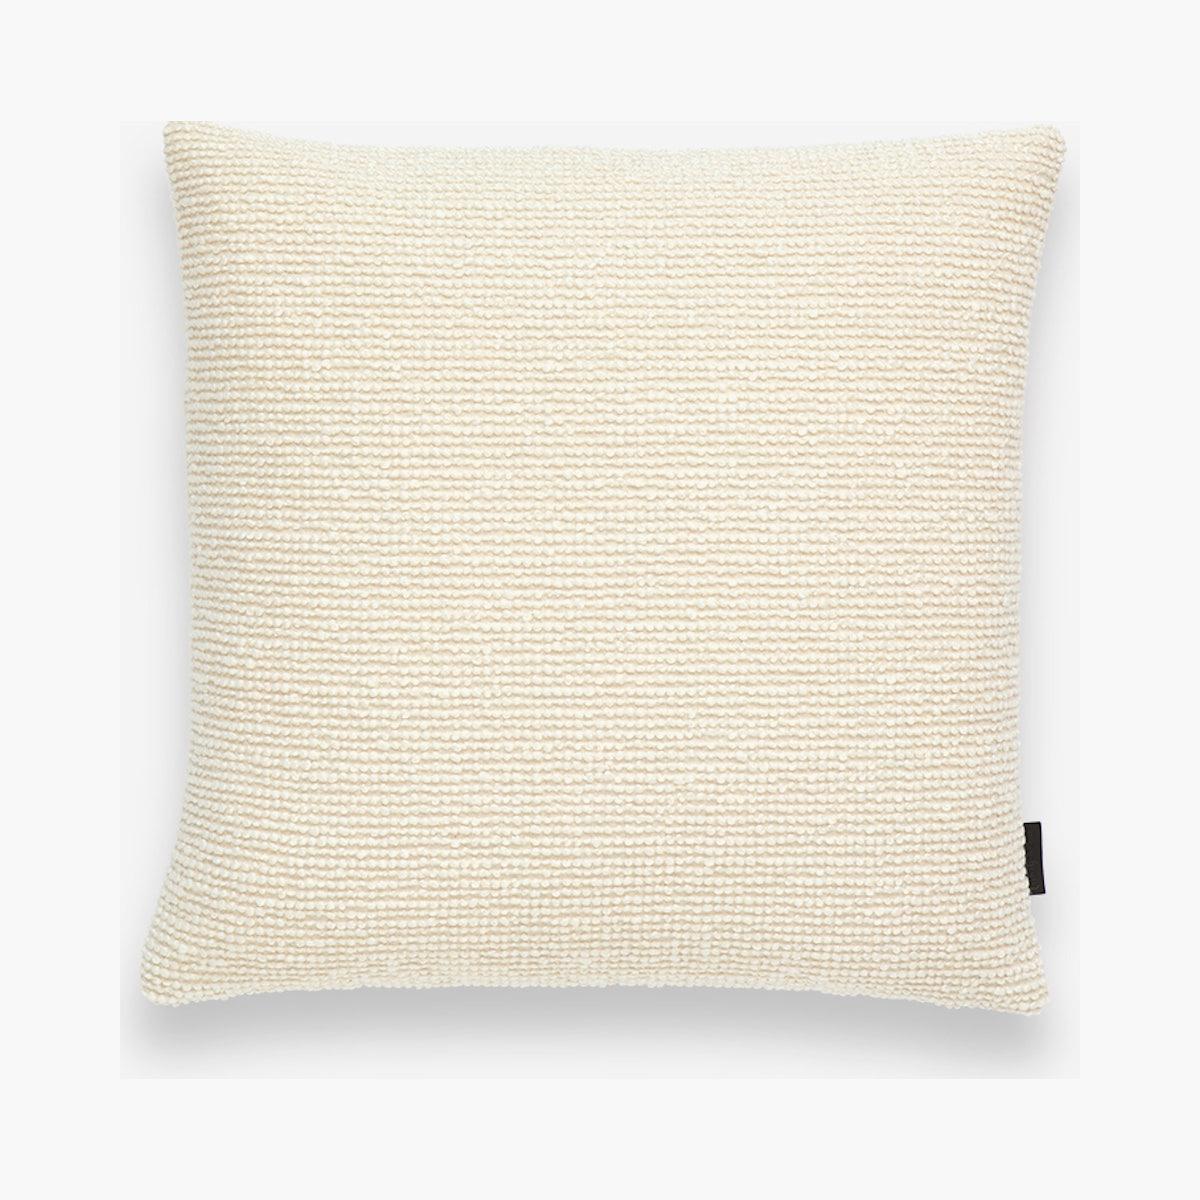 Nestle Pillow